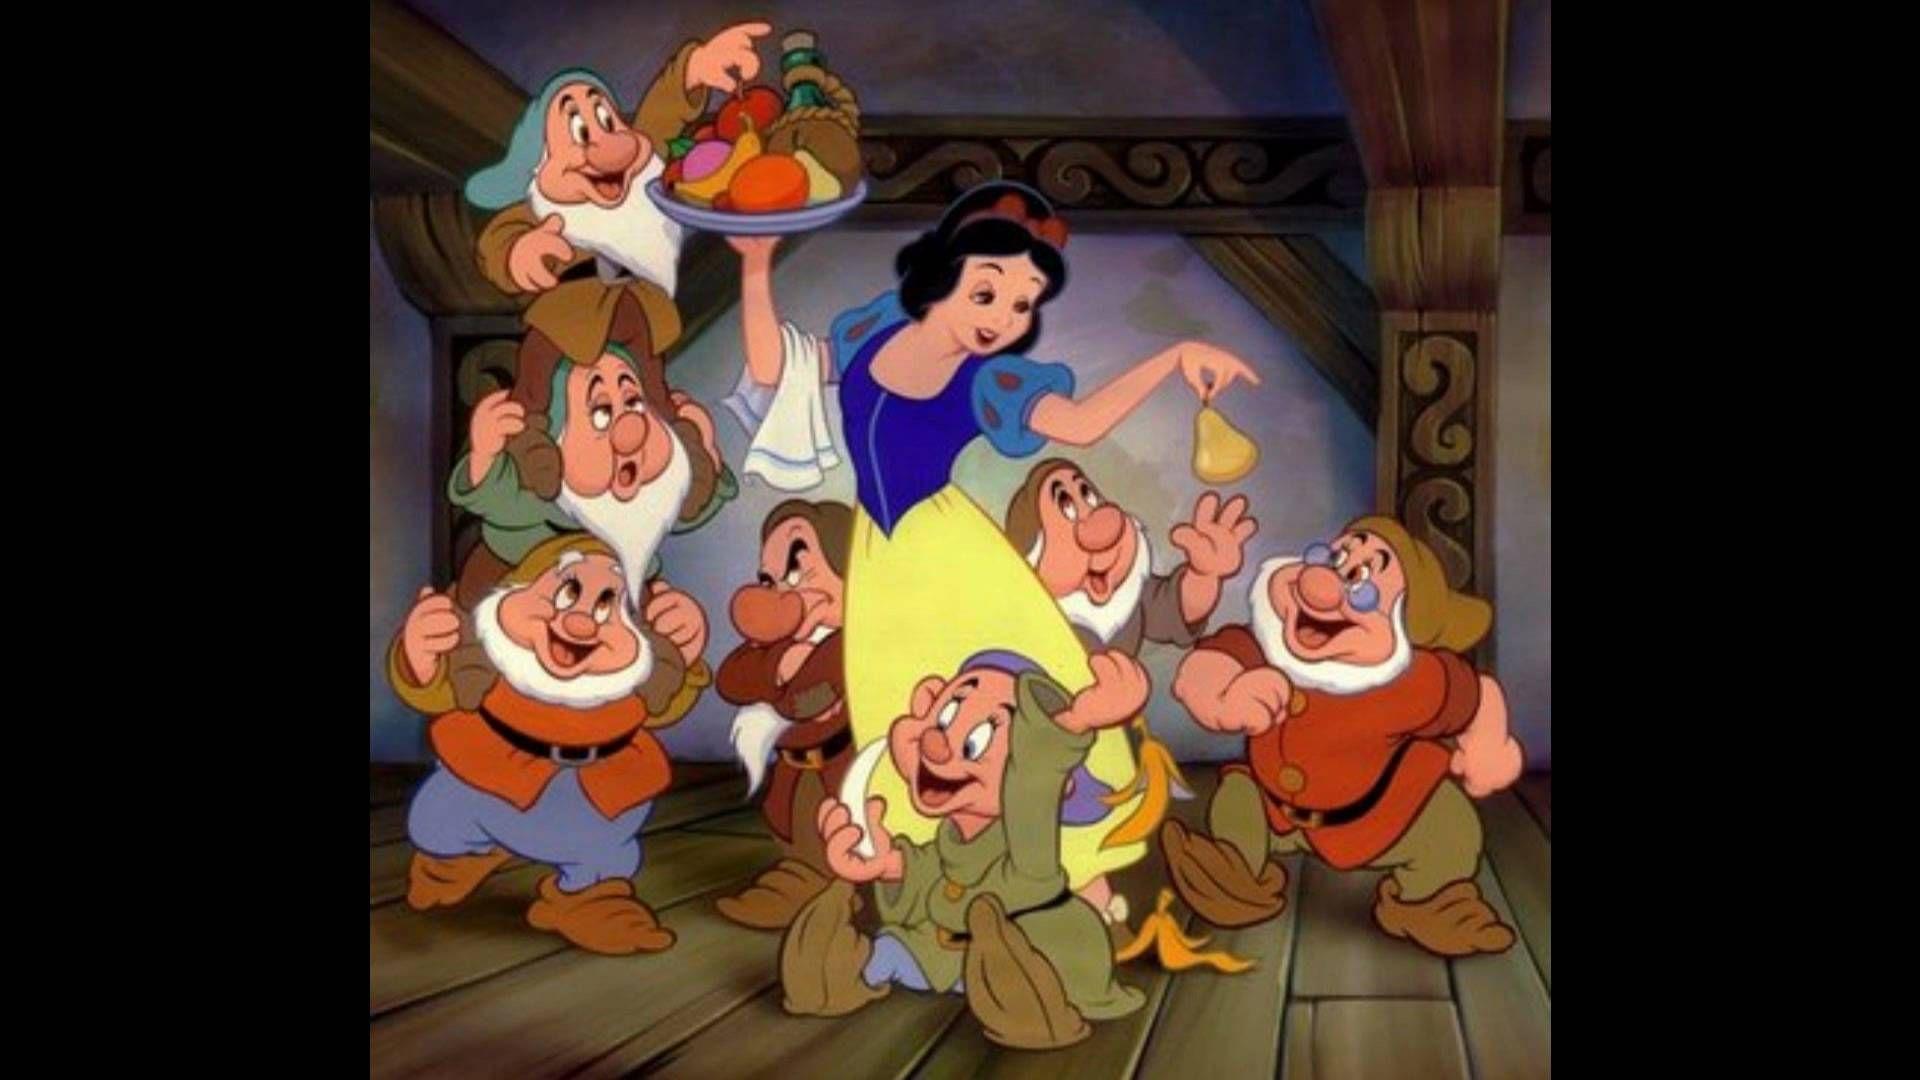 Blanca Nieves Y Los Siete Enanitos Snow White Cartoon Disney Art Disney Princesses And Princes